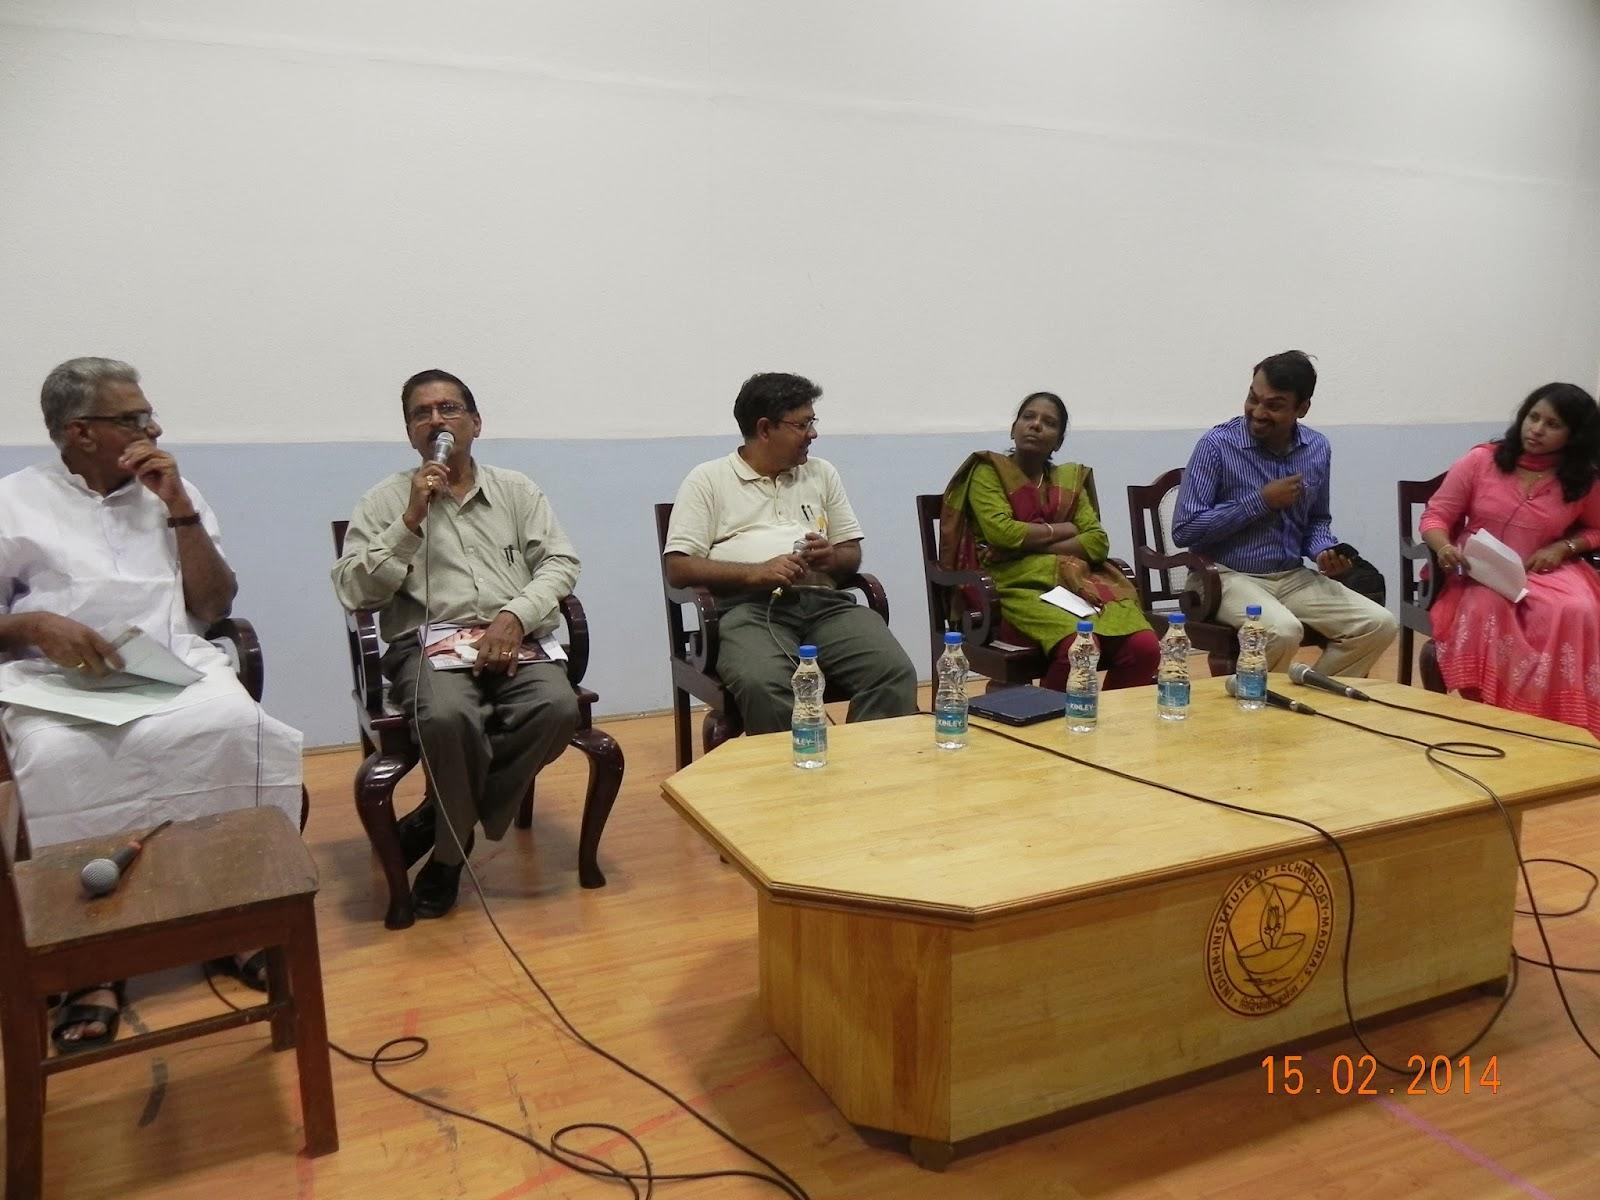 (L to R) Ramalingam, R Bhagwan Singh, Badri Seshadri, Josephine, Pandey and Bhanu Gomes